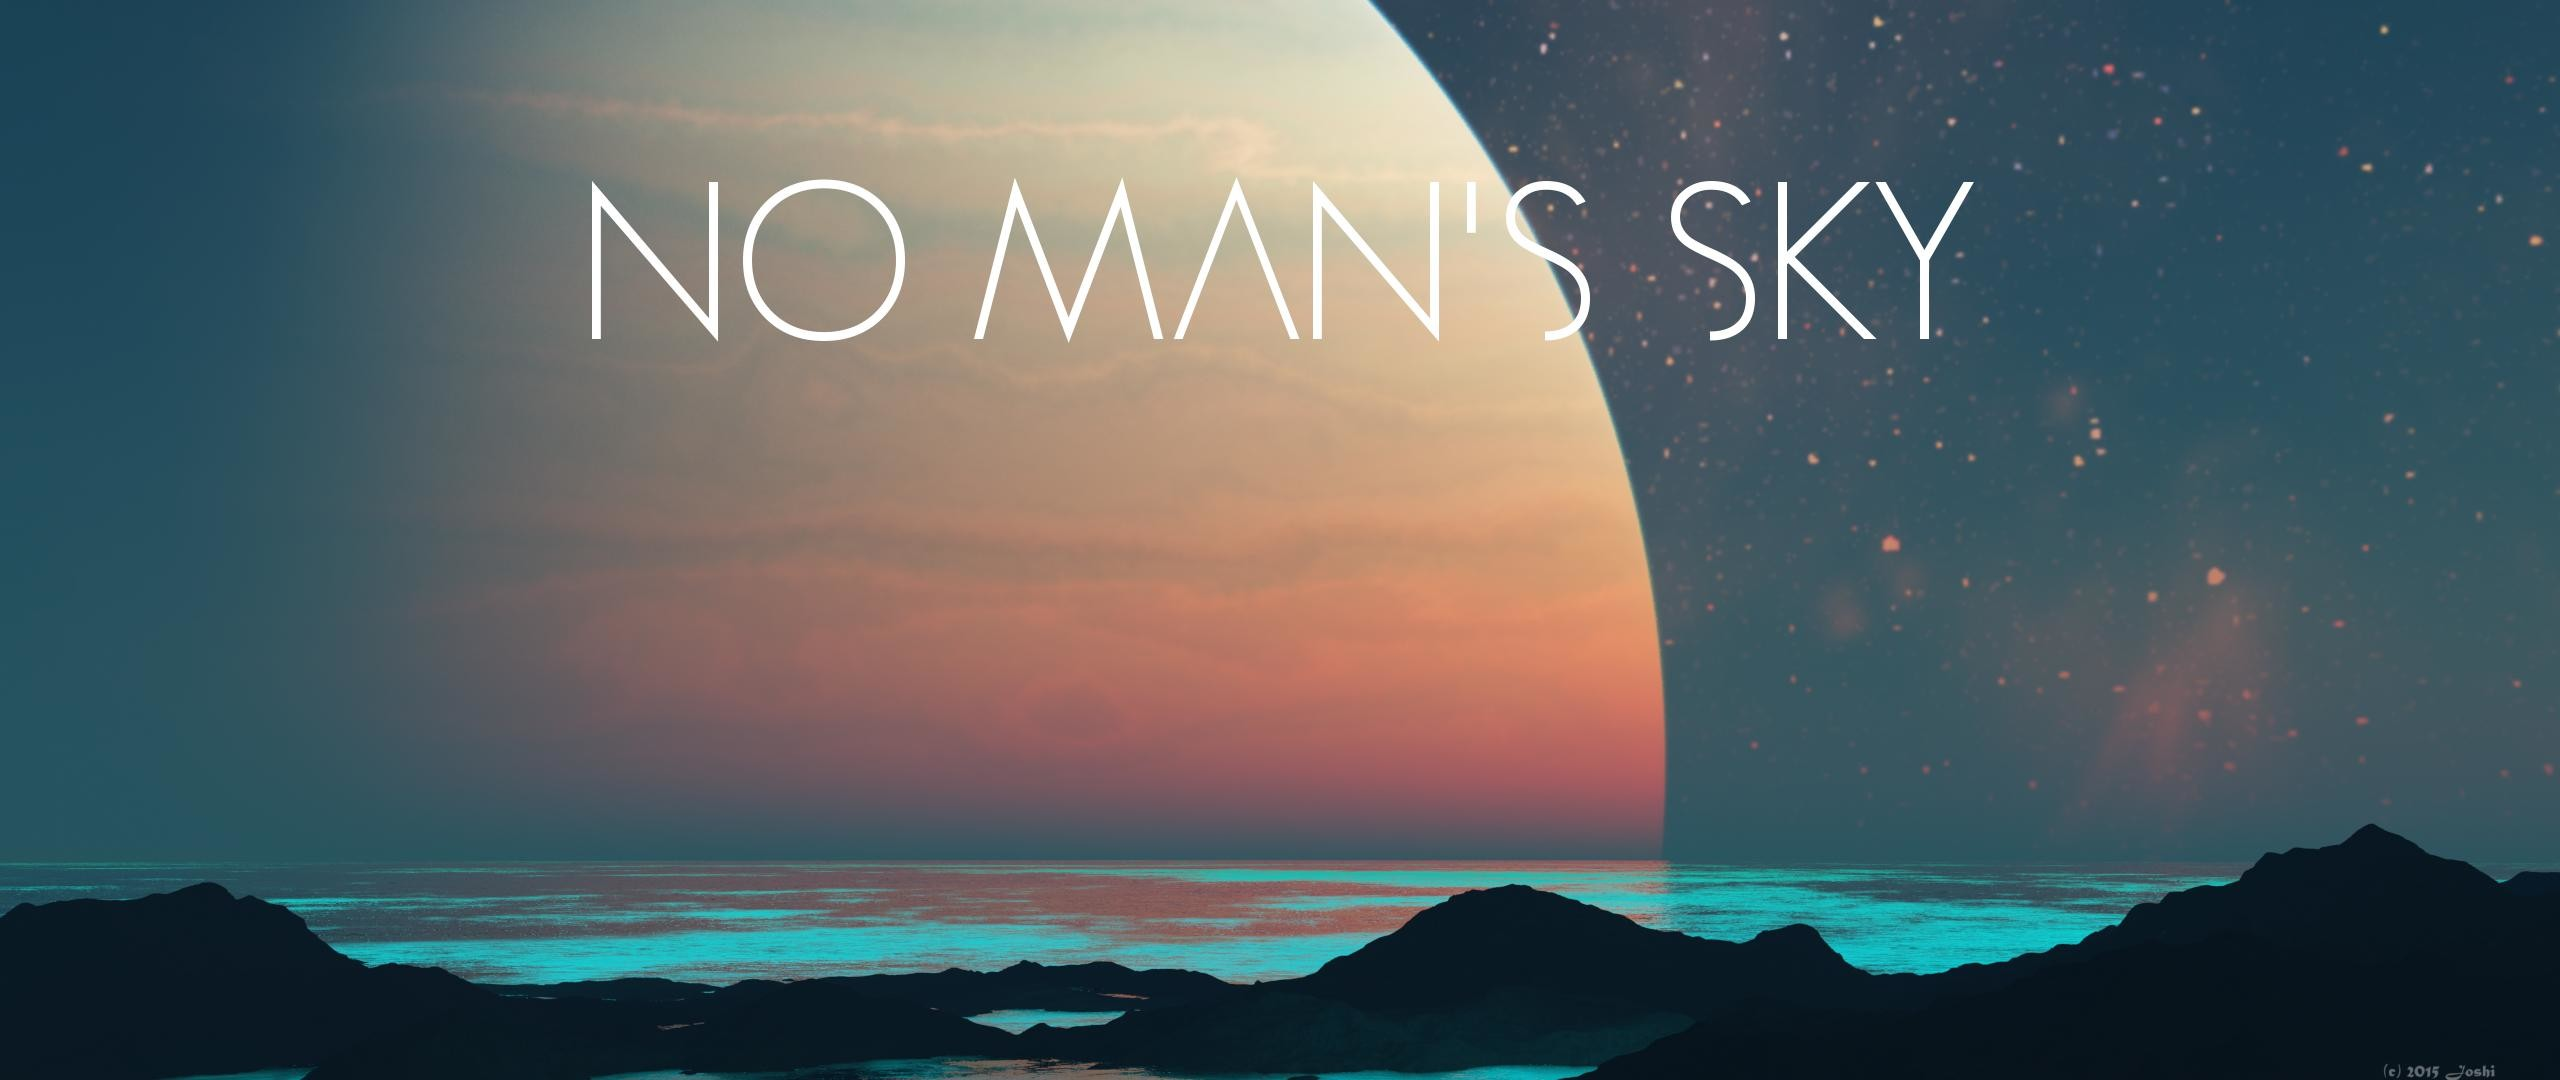 No Man's Sky Dual Monitor Wallpaper 2560×1080